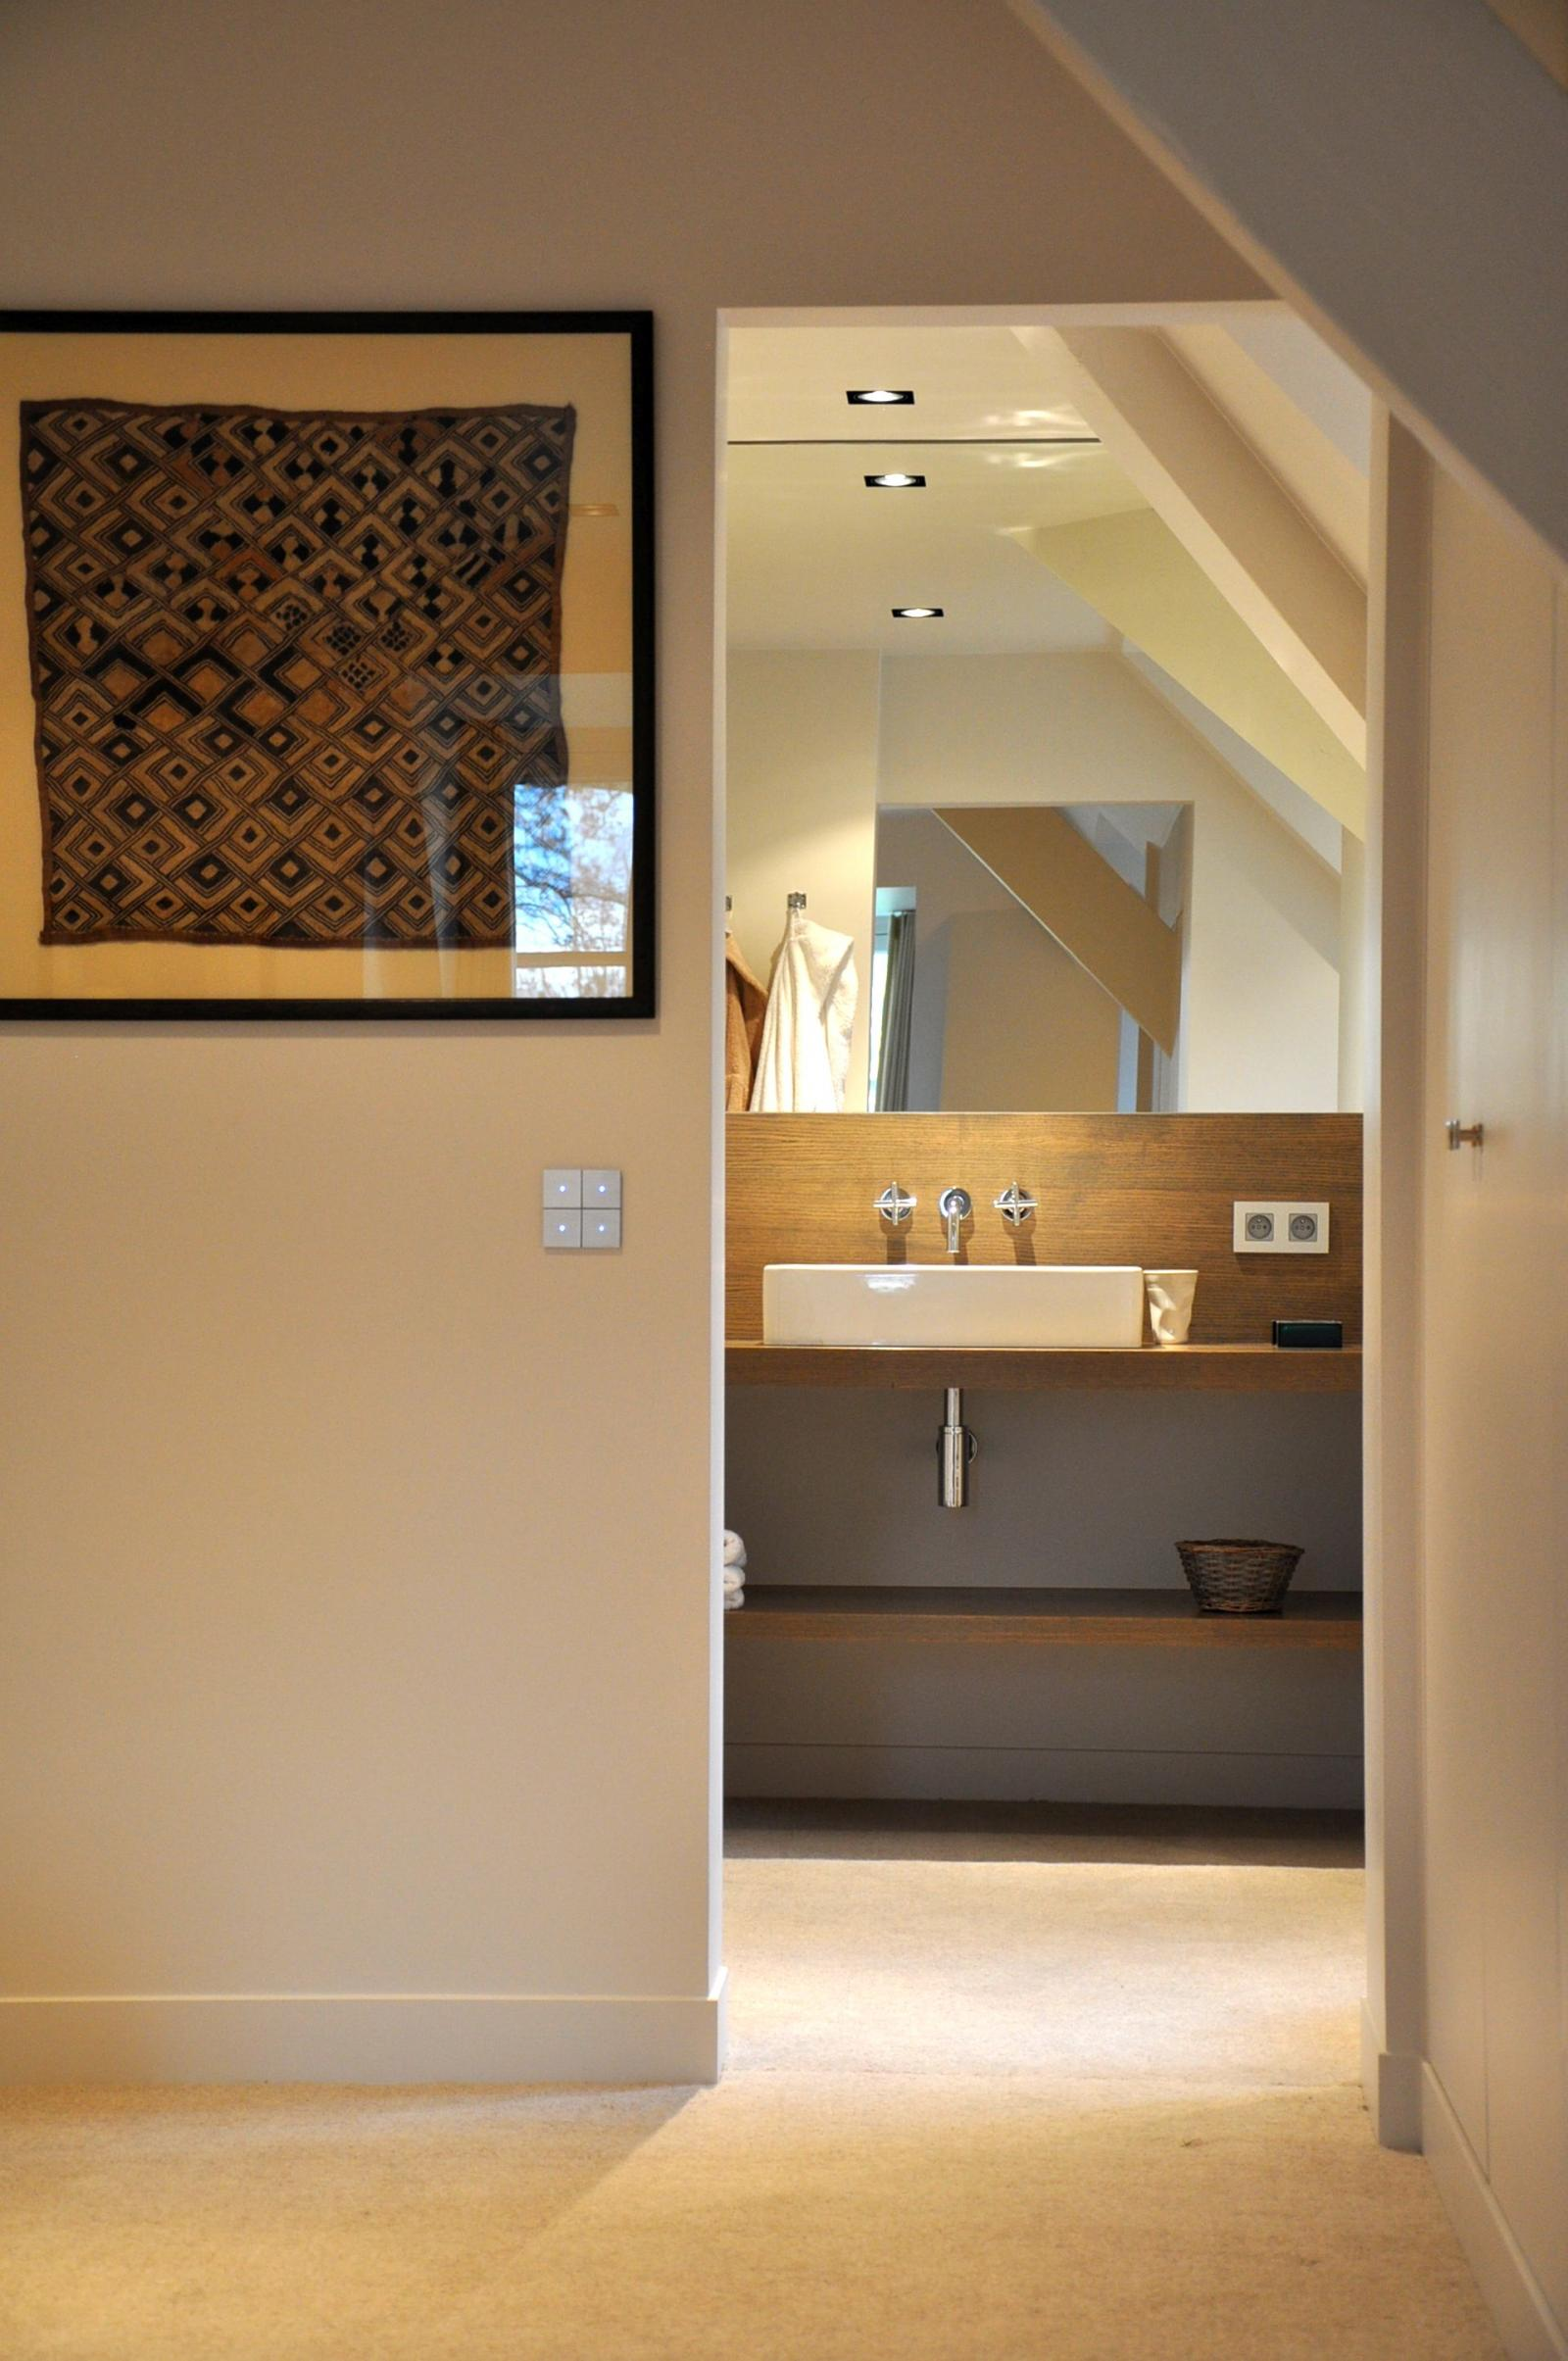 #interieurarchitect #binnenhuisarchitect #totaalinrichting #renovatie #decorateur